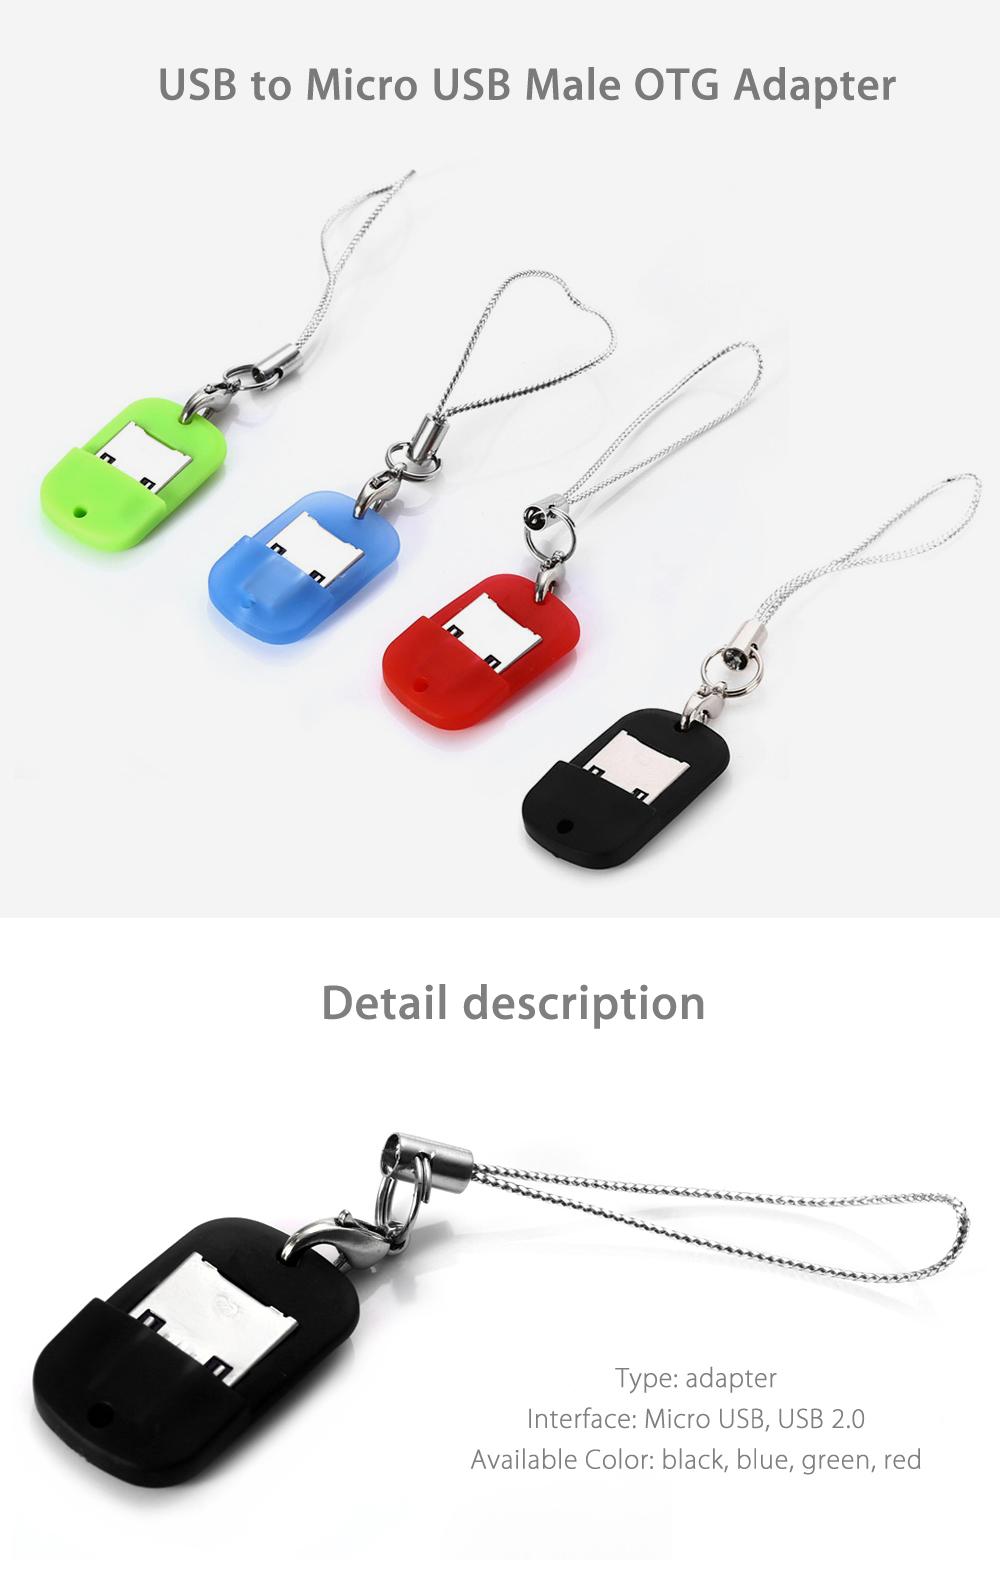 OTG Adapter Micro USB - USB za 40 groszy @ Gearbest